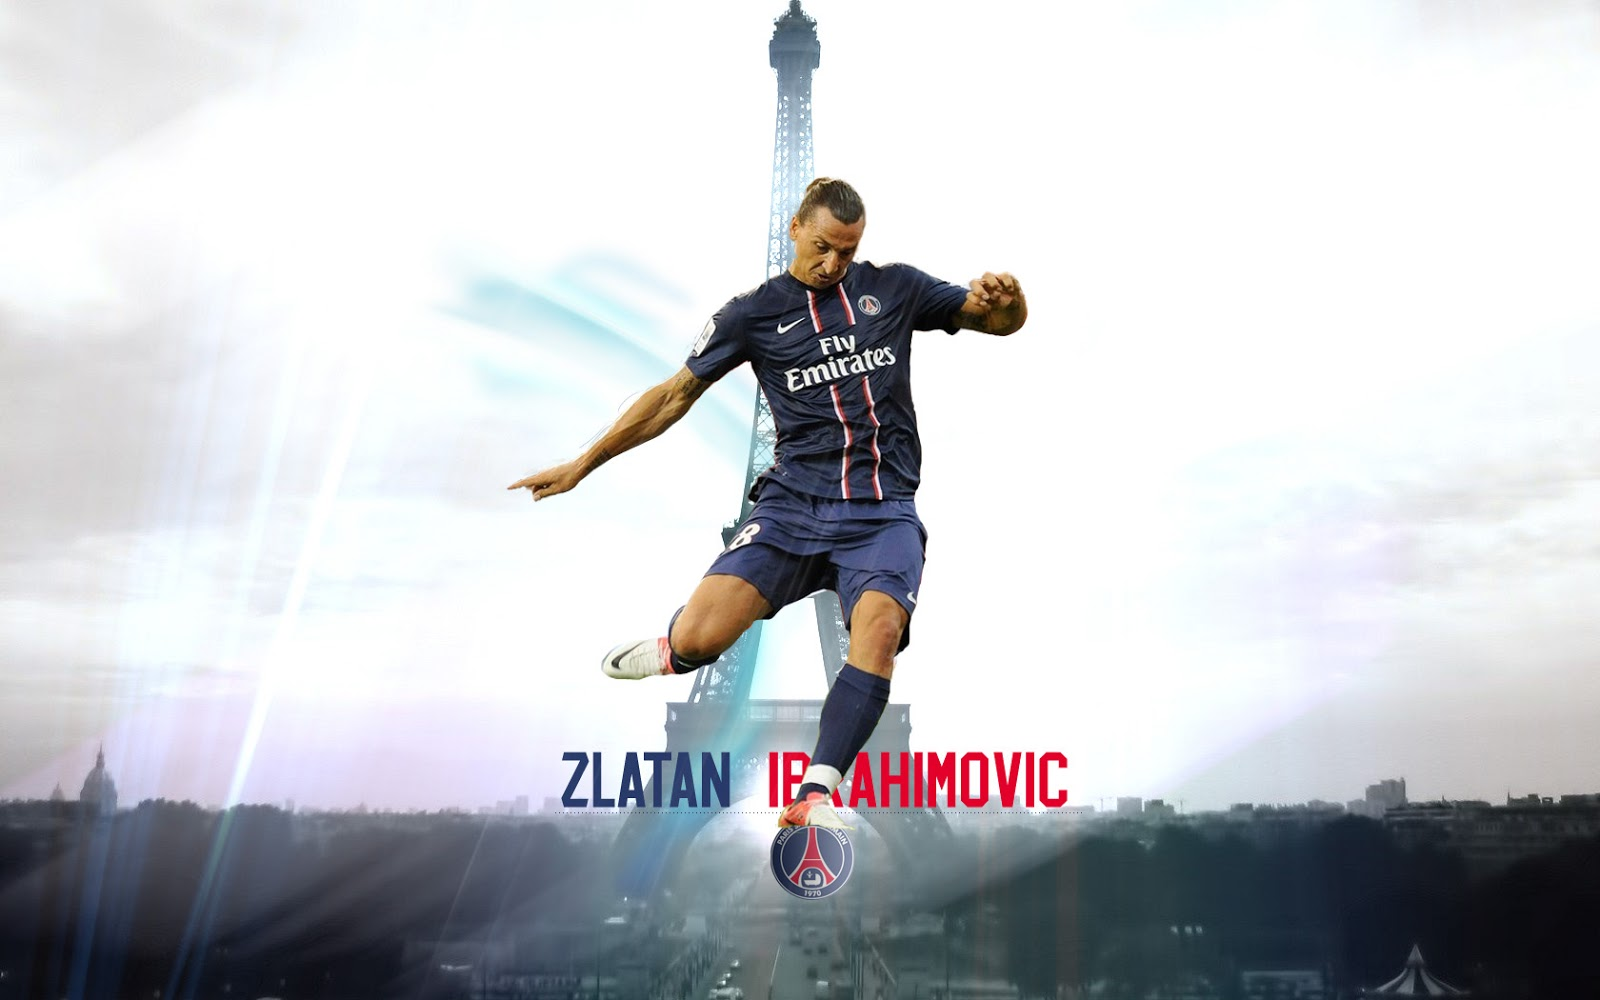 Zlatan Ibrahimovic Wallpaper 2014 Zlatan Ibrahimovic New...